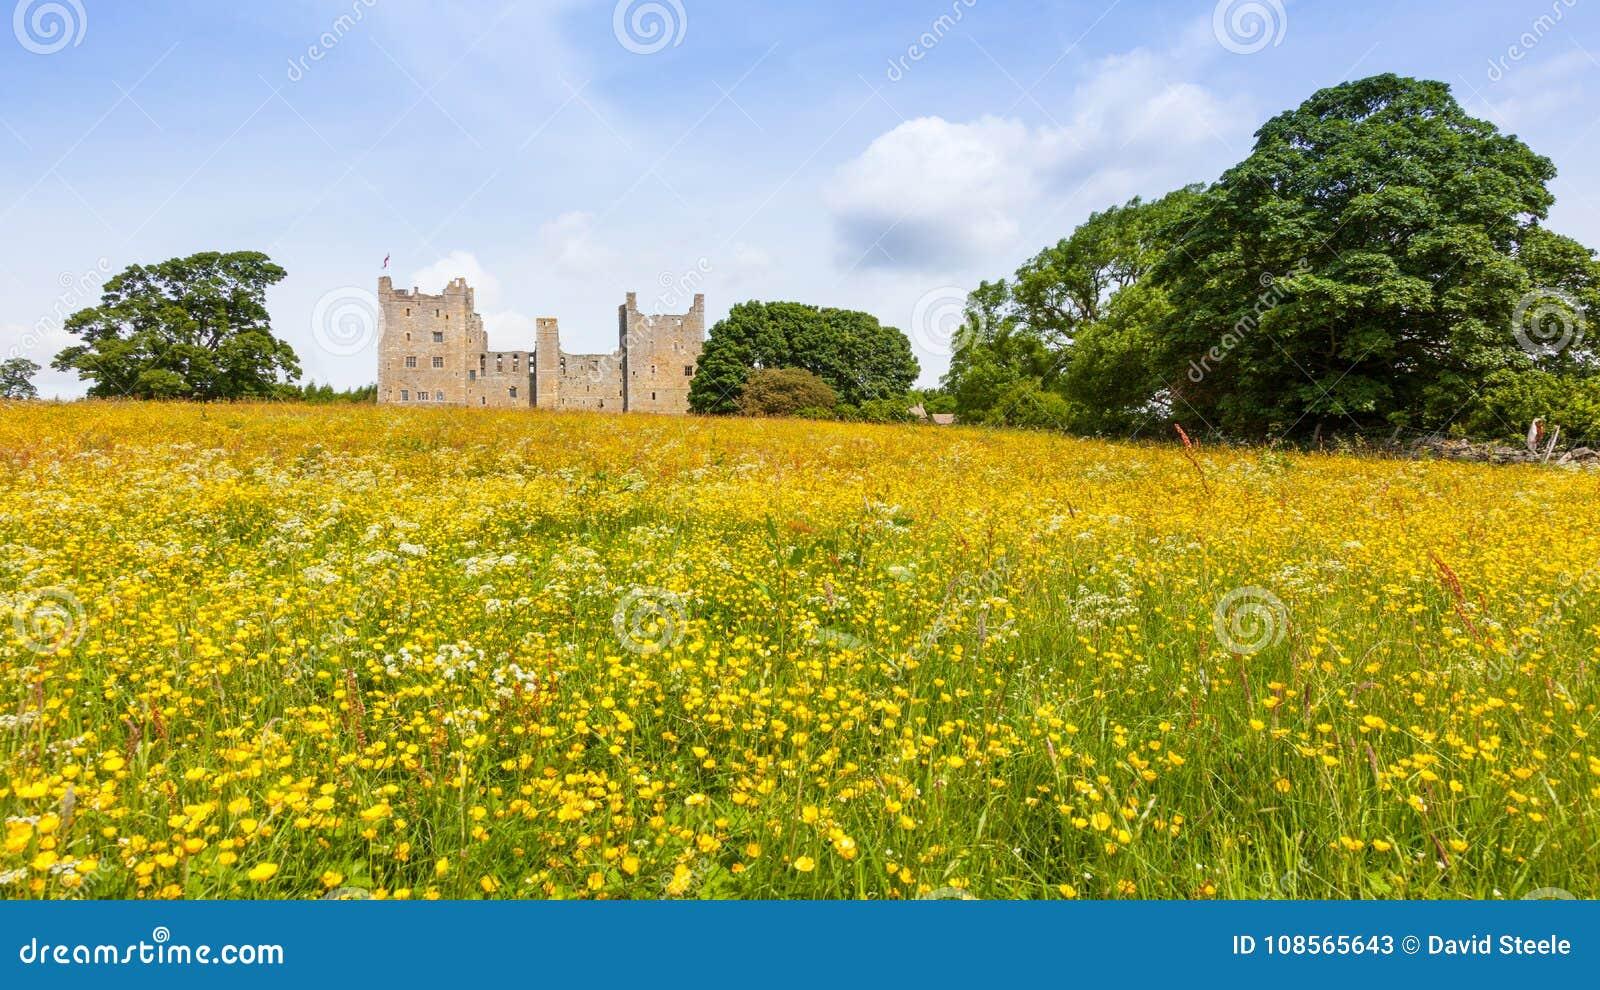 Bolton Castle in North Yorkshire